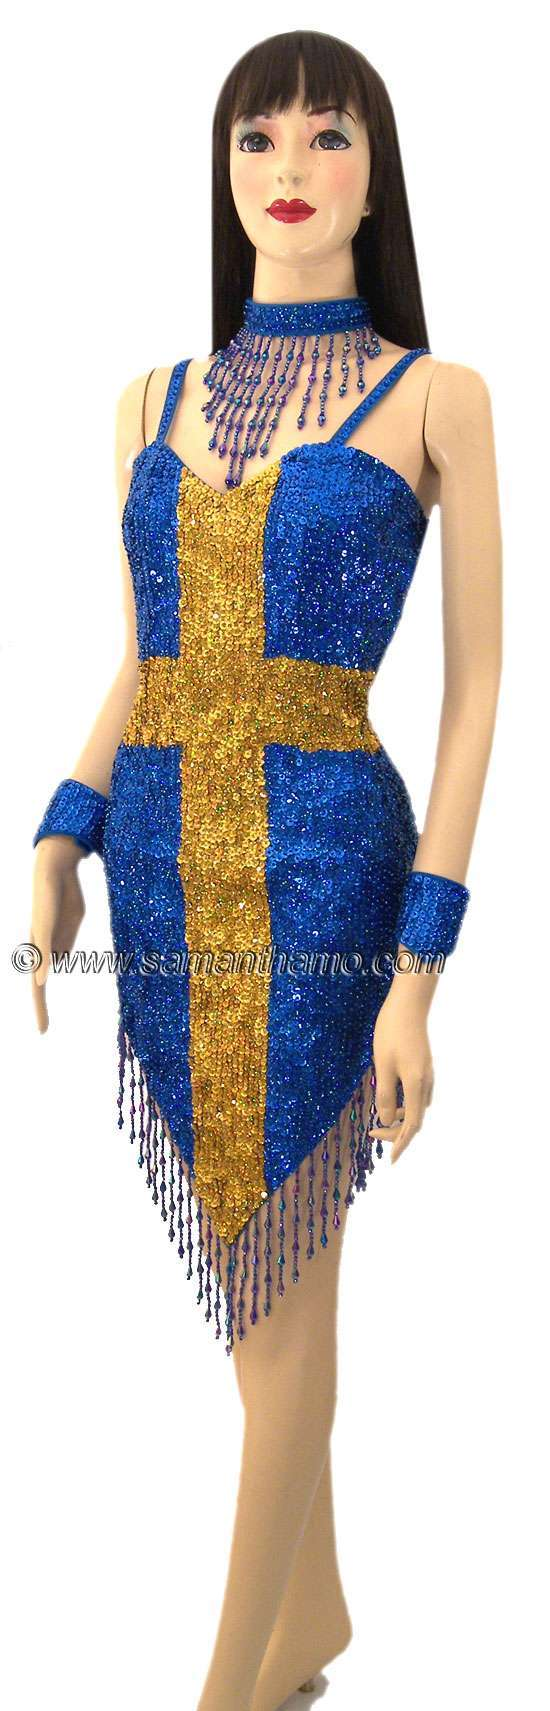 Sdw428 tailor made sequin sweden flag dance dress 169 for Tailor made shirts online